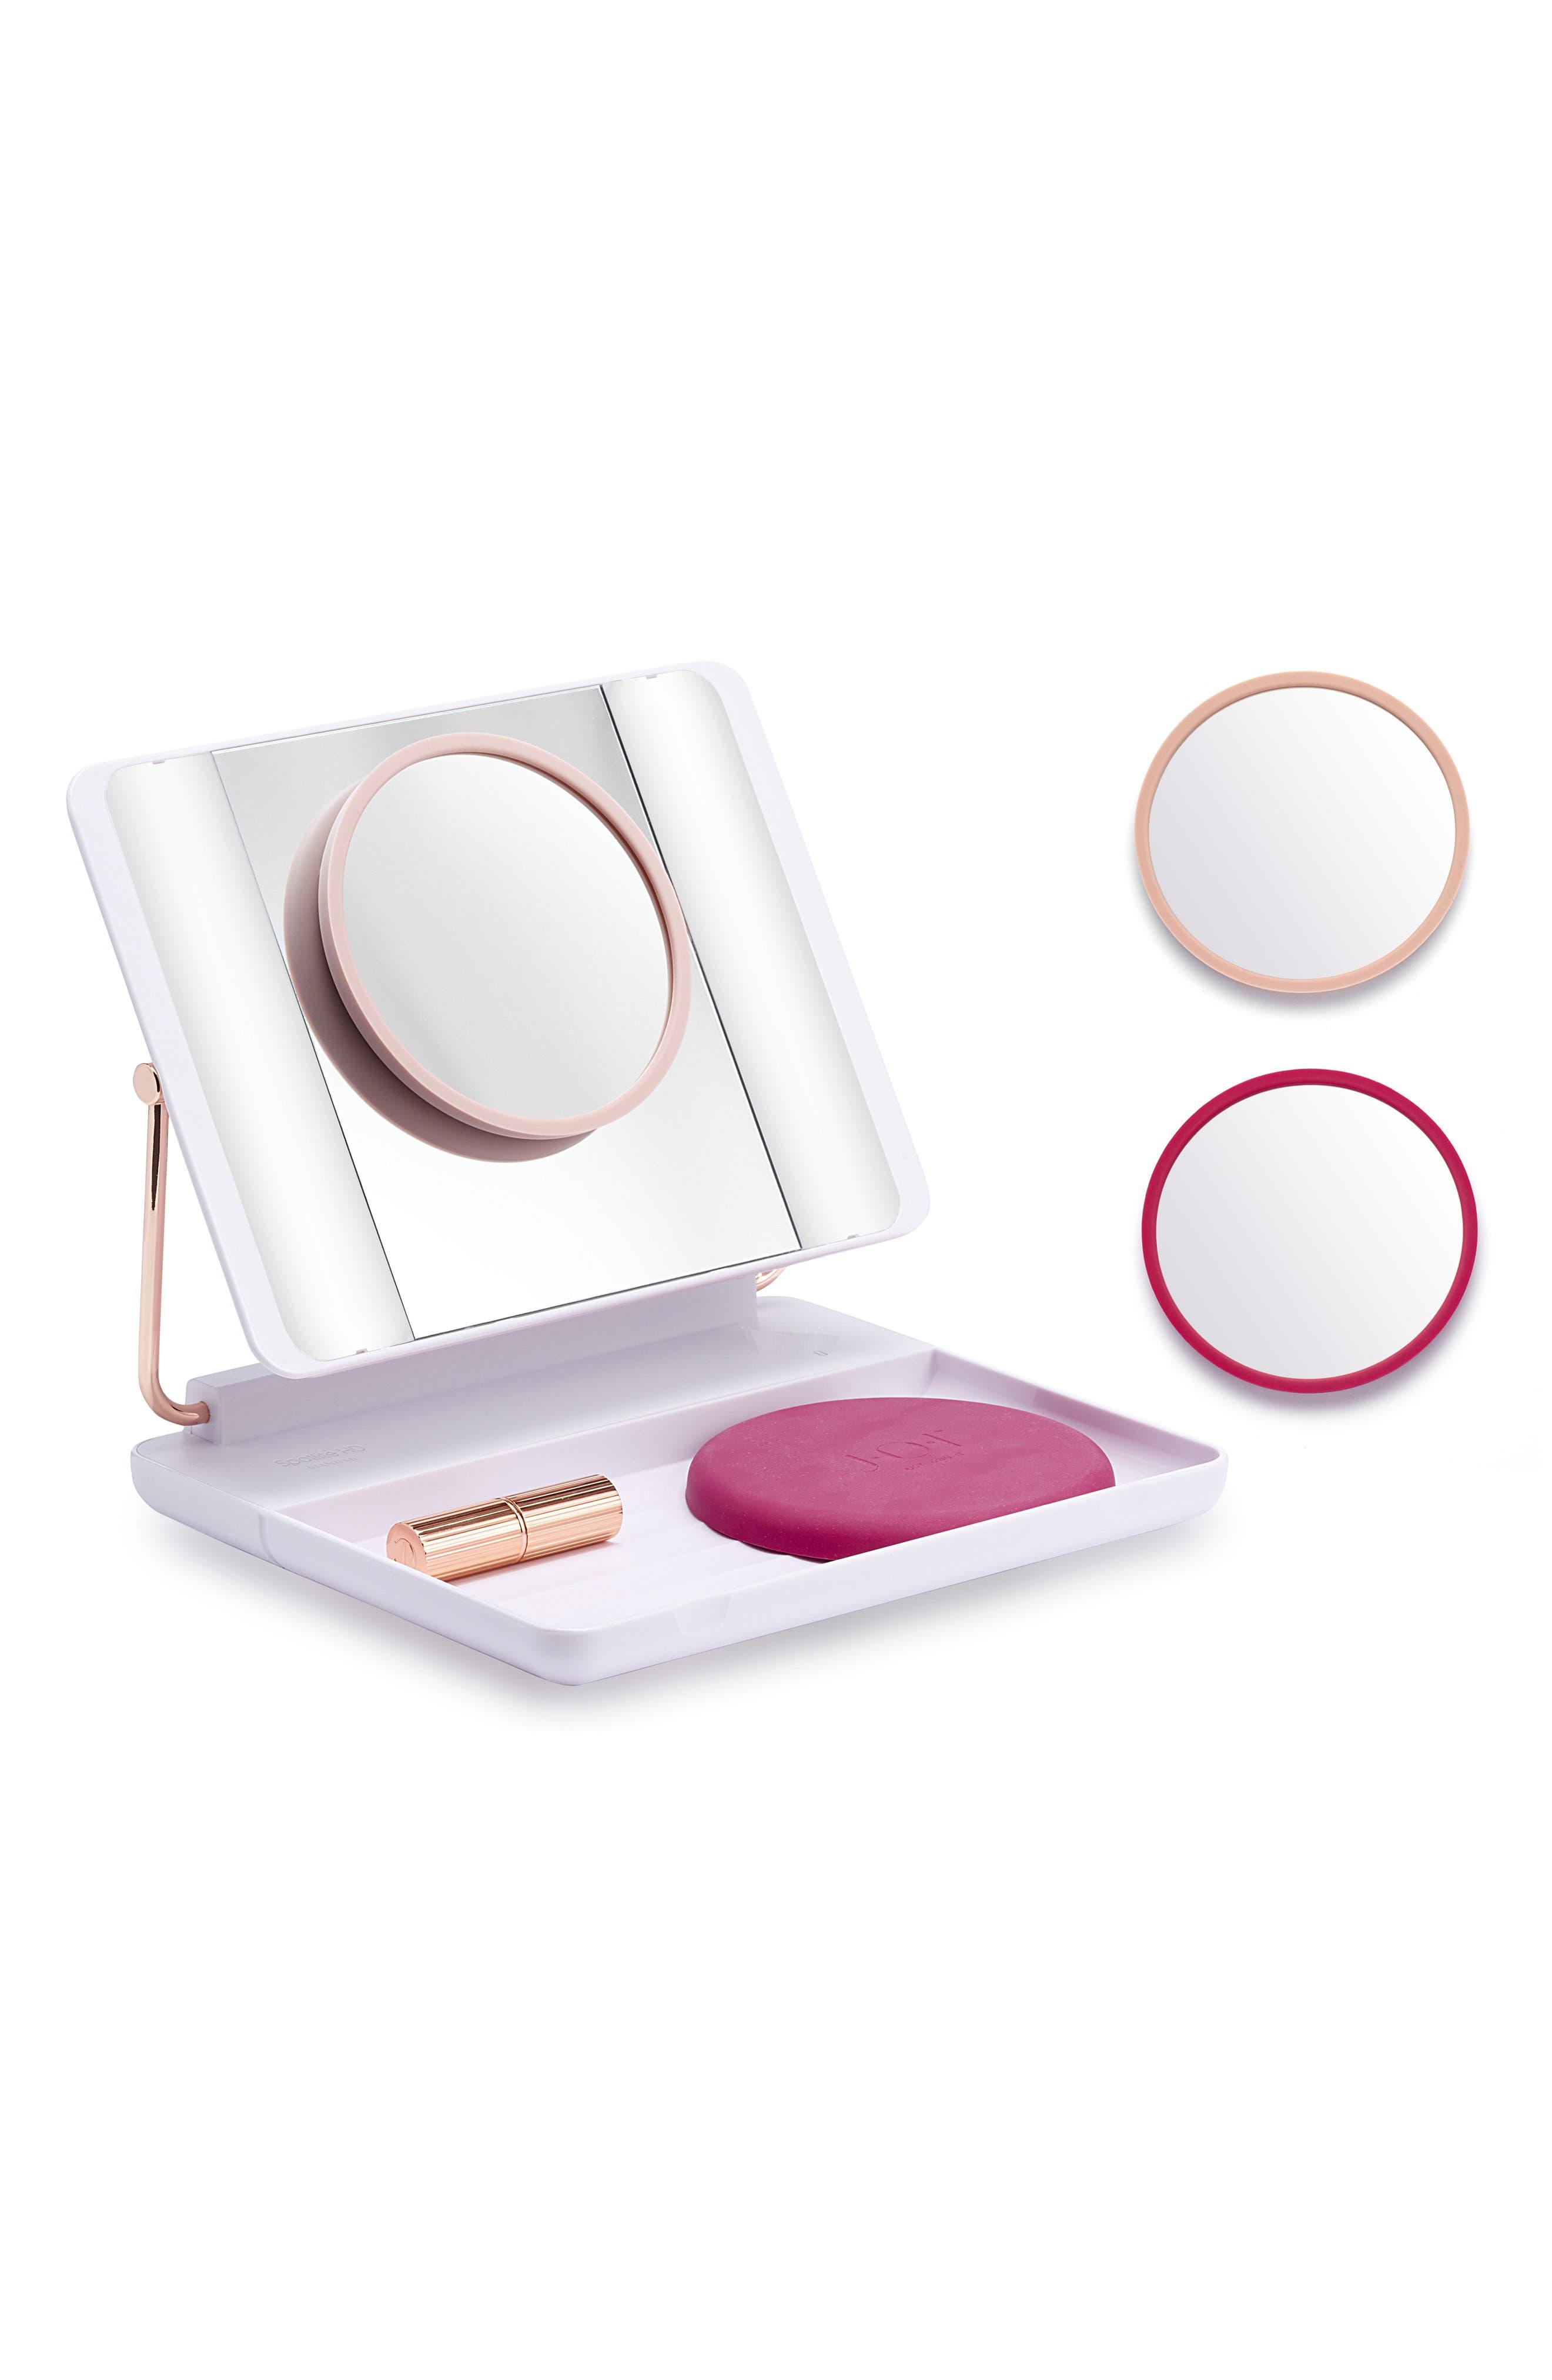 JOI Spotlite HD Diamond Makeup Mirror in Hot Blush,                             Main thumbnail 1, color,                             000